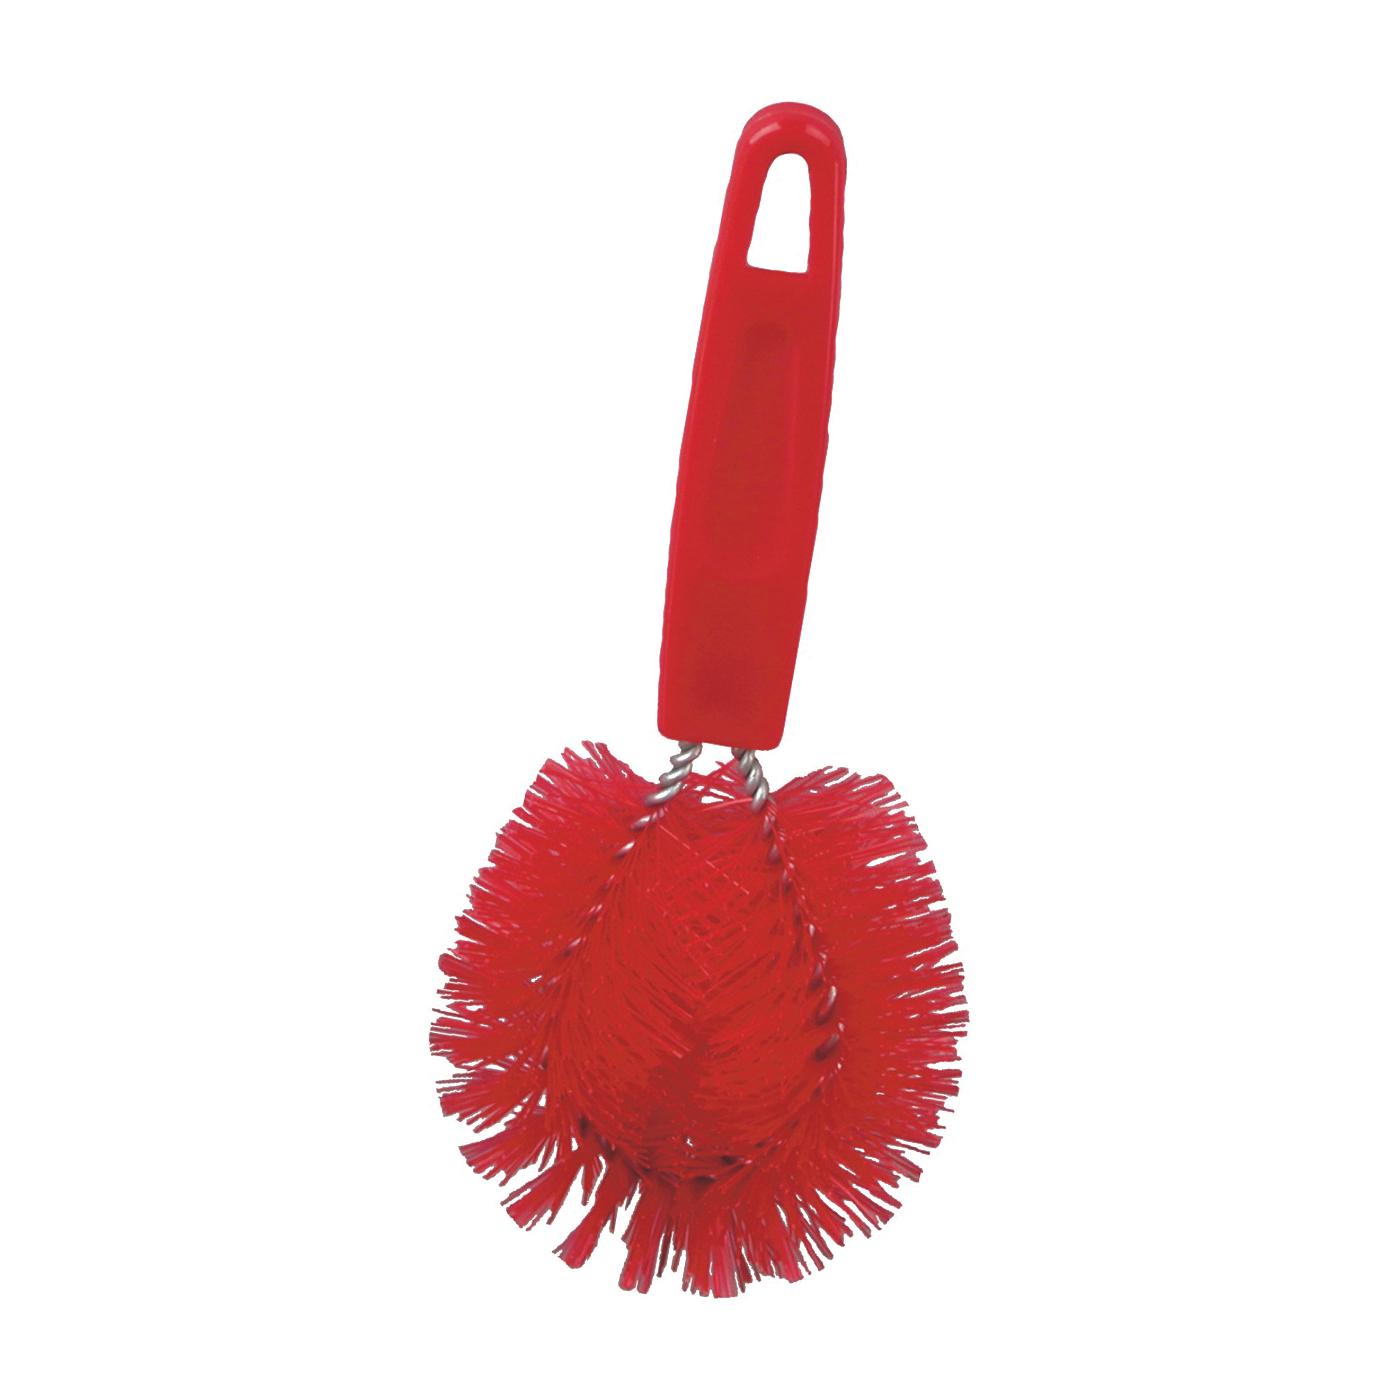 Picture of BIRDWELL 240-48 Vegetable/Dish Brush, Polypropylene Bristle, Polypropylene Handle, Assorted